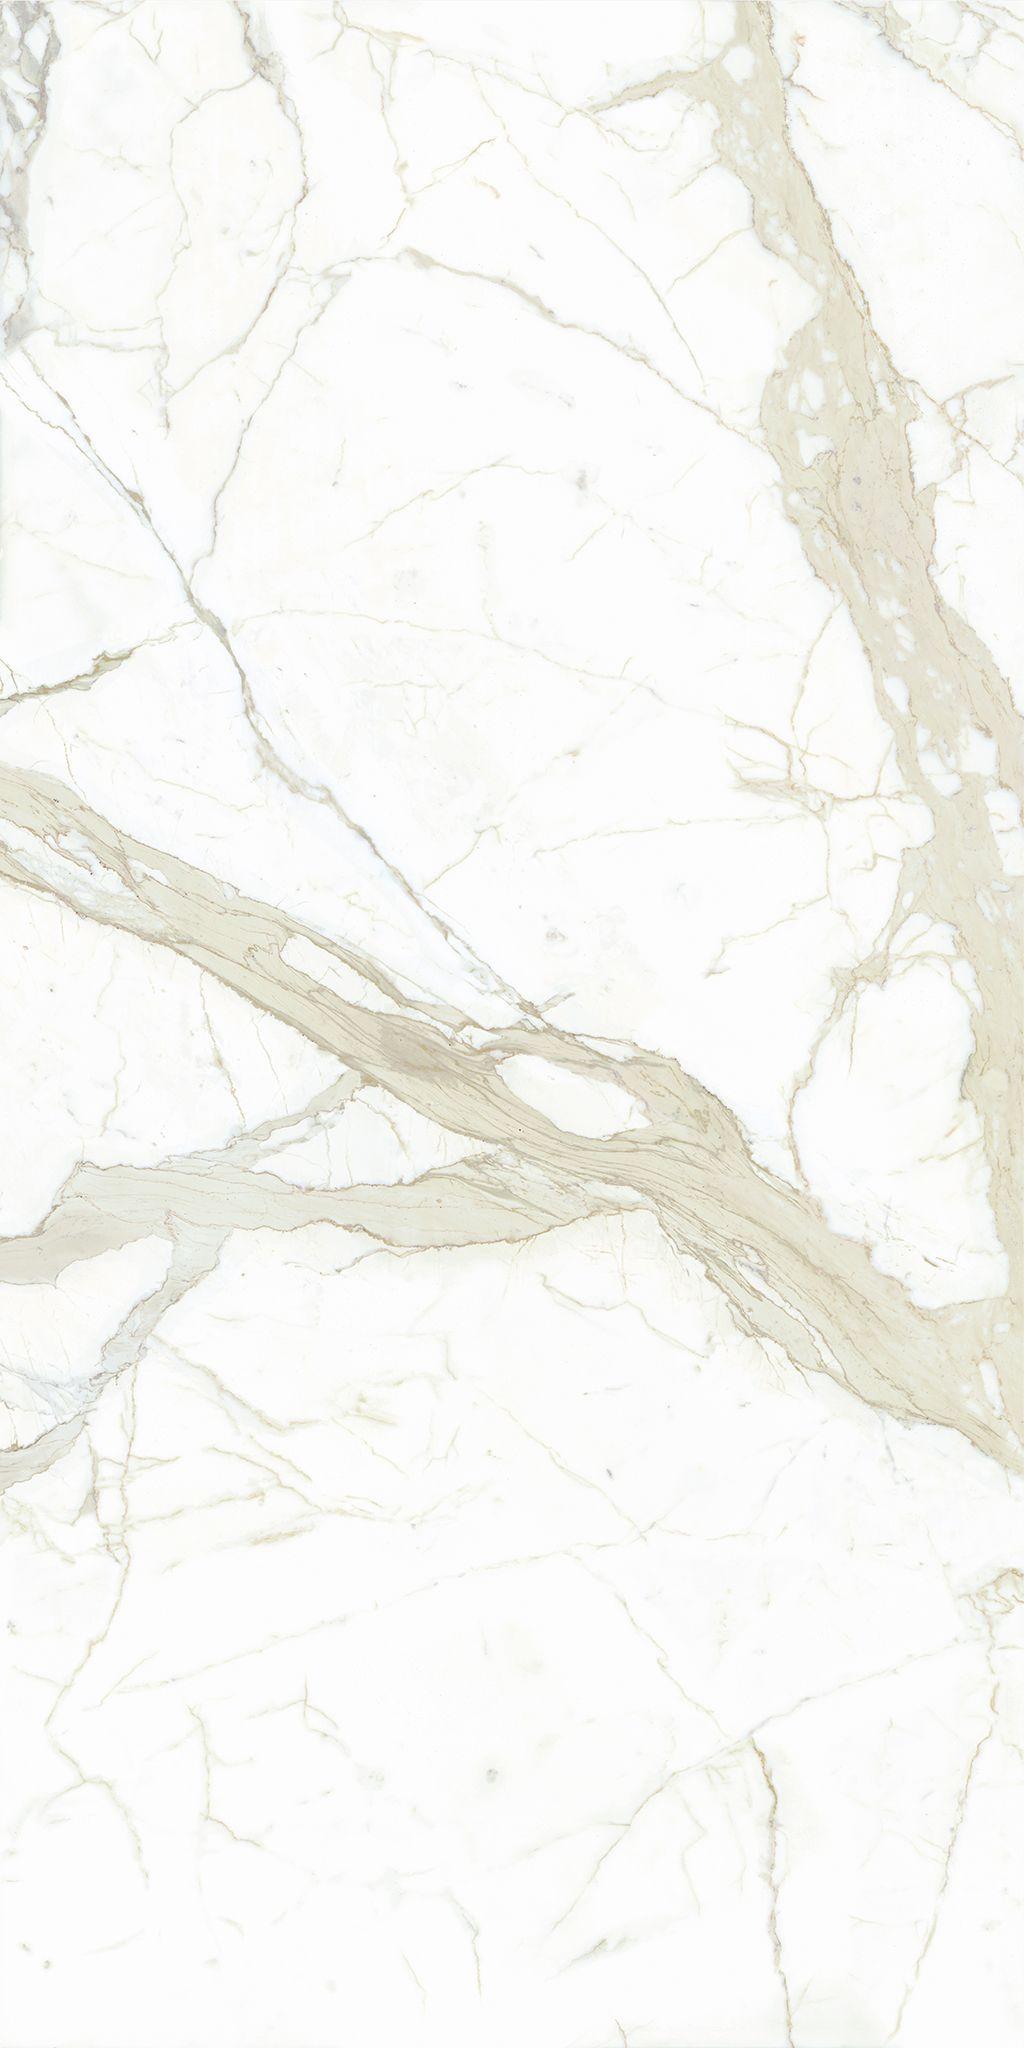 Ariostea Bianco Calacatta Ultra Marmi Marmi Calacatta Nel 2019